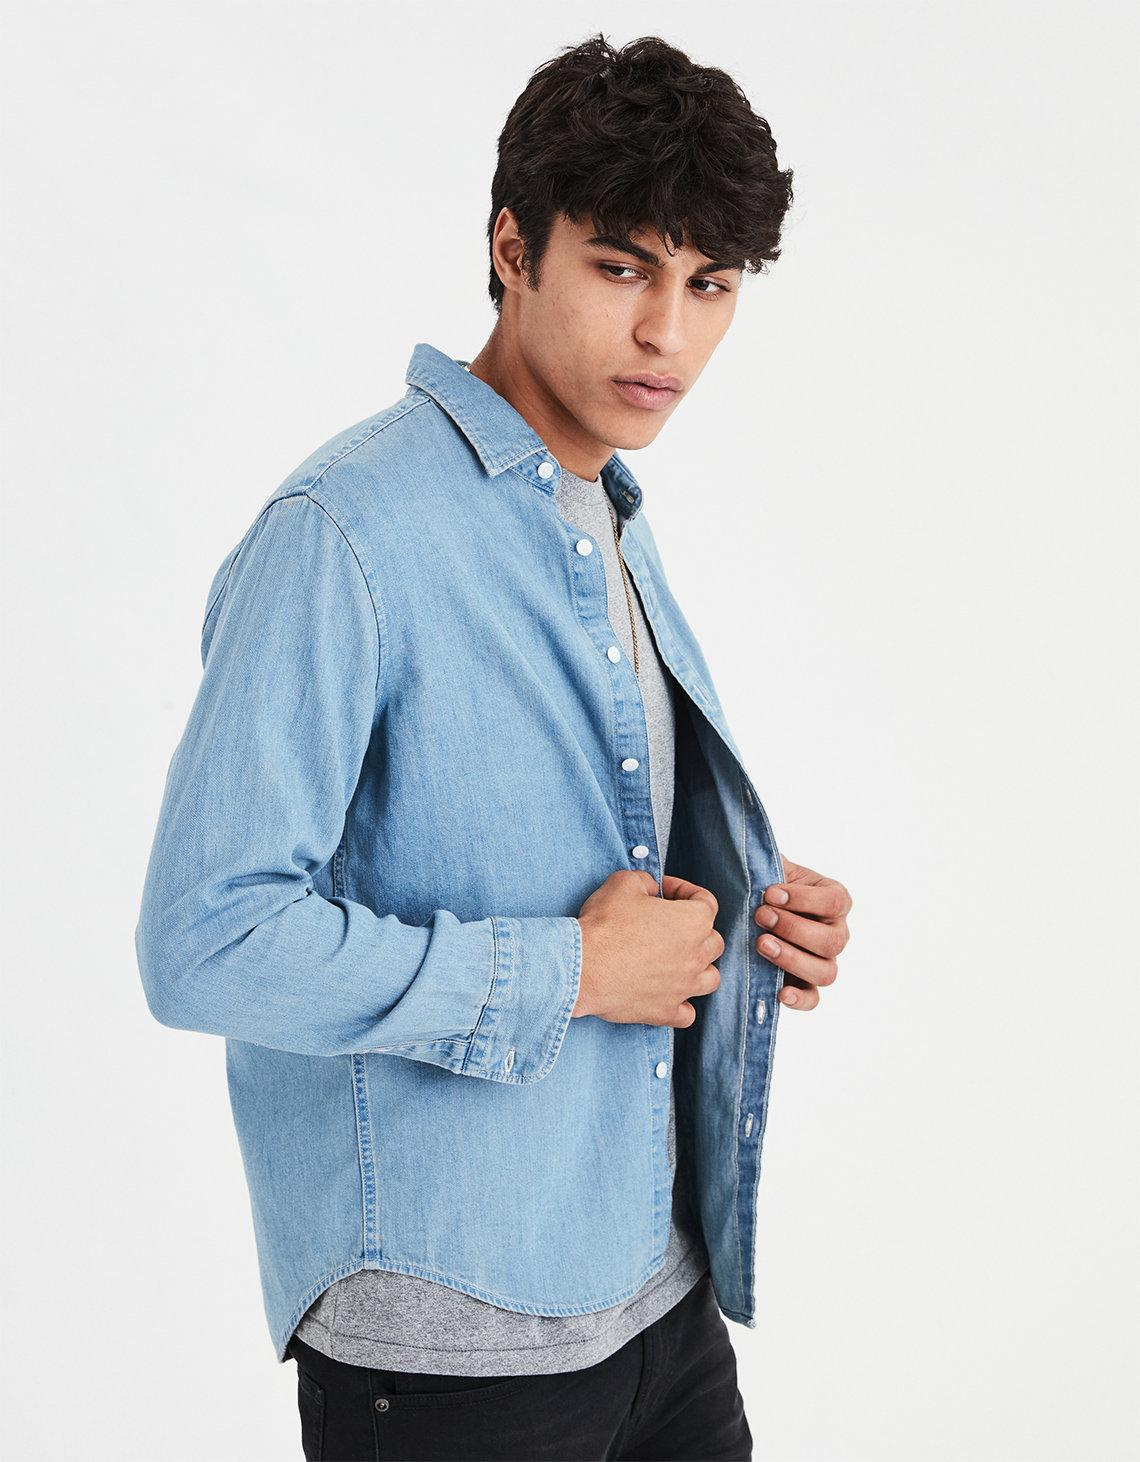 3e2779ff8d1 Lyst - American Eagle Ae Denim Button Down Shirt in Blue for Men